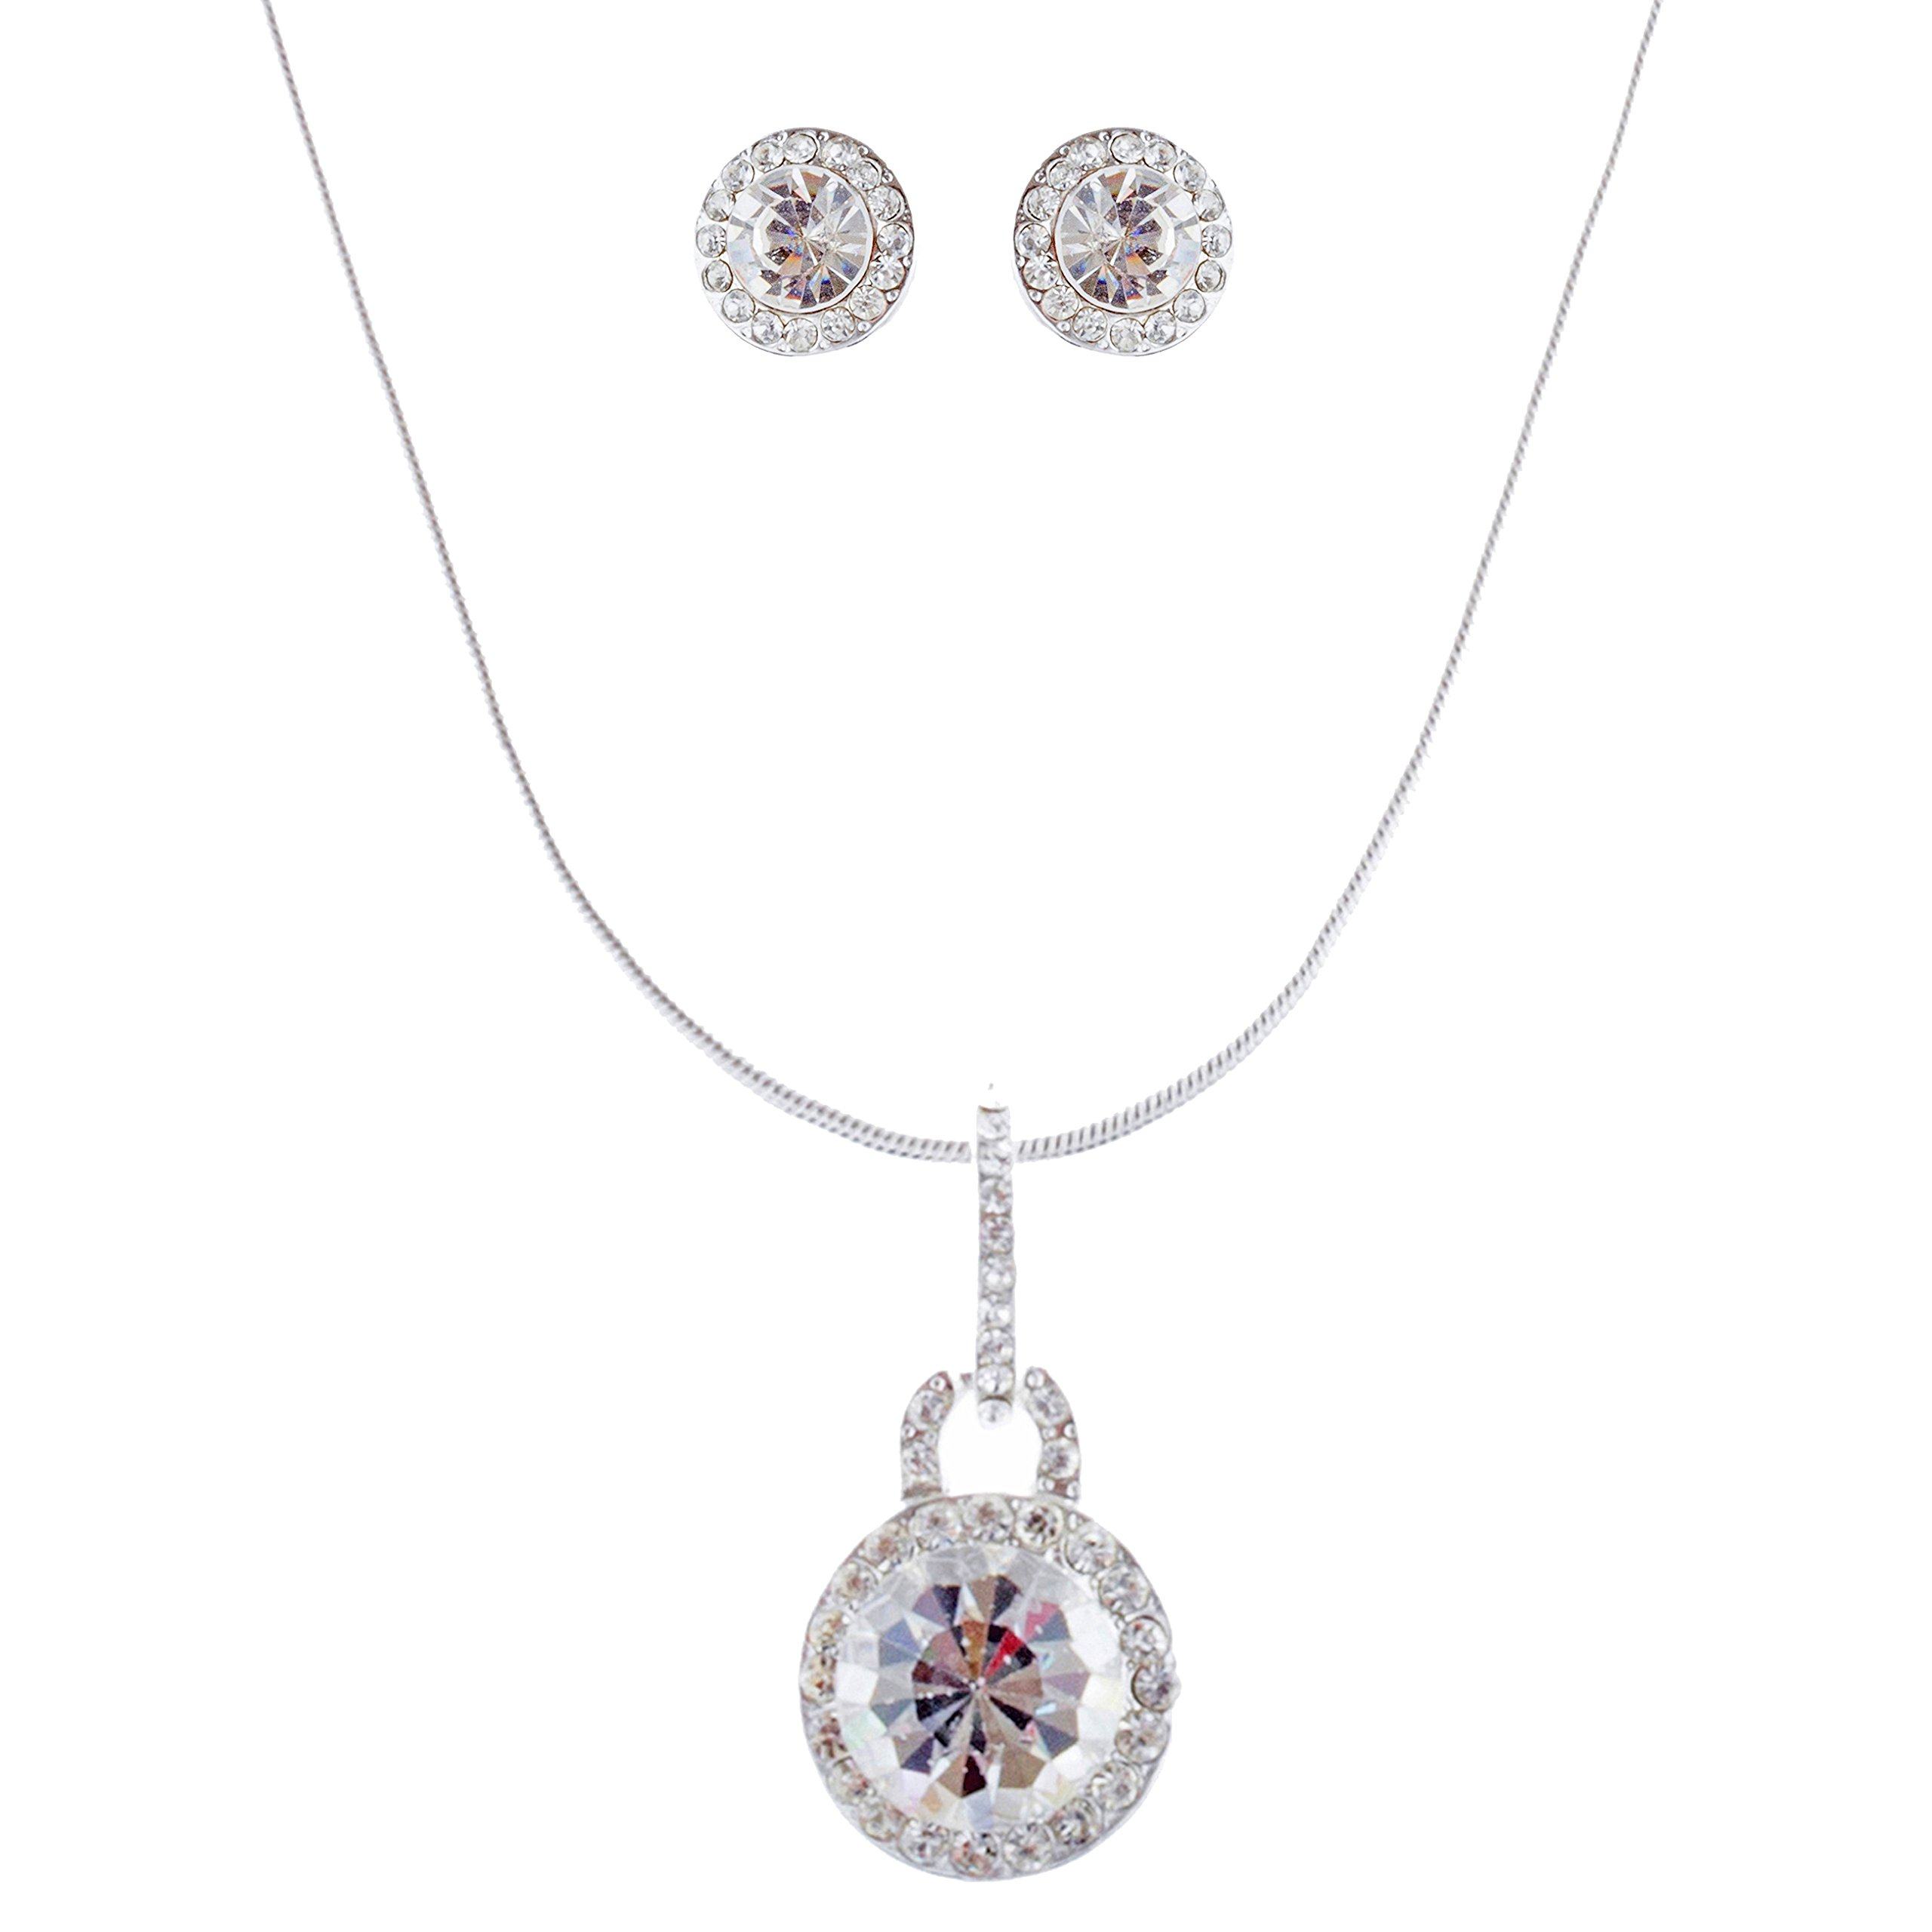 ACCESSORIESFOREVER Bridal Wedding Prom Jewelry Set Crystal Rhinestone Simple Soft Linear Drop J378